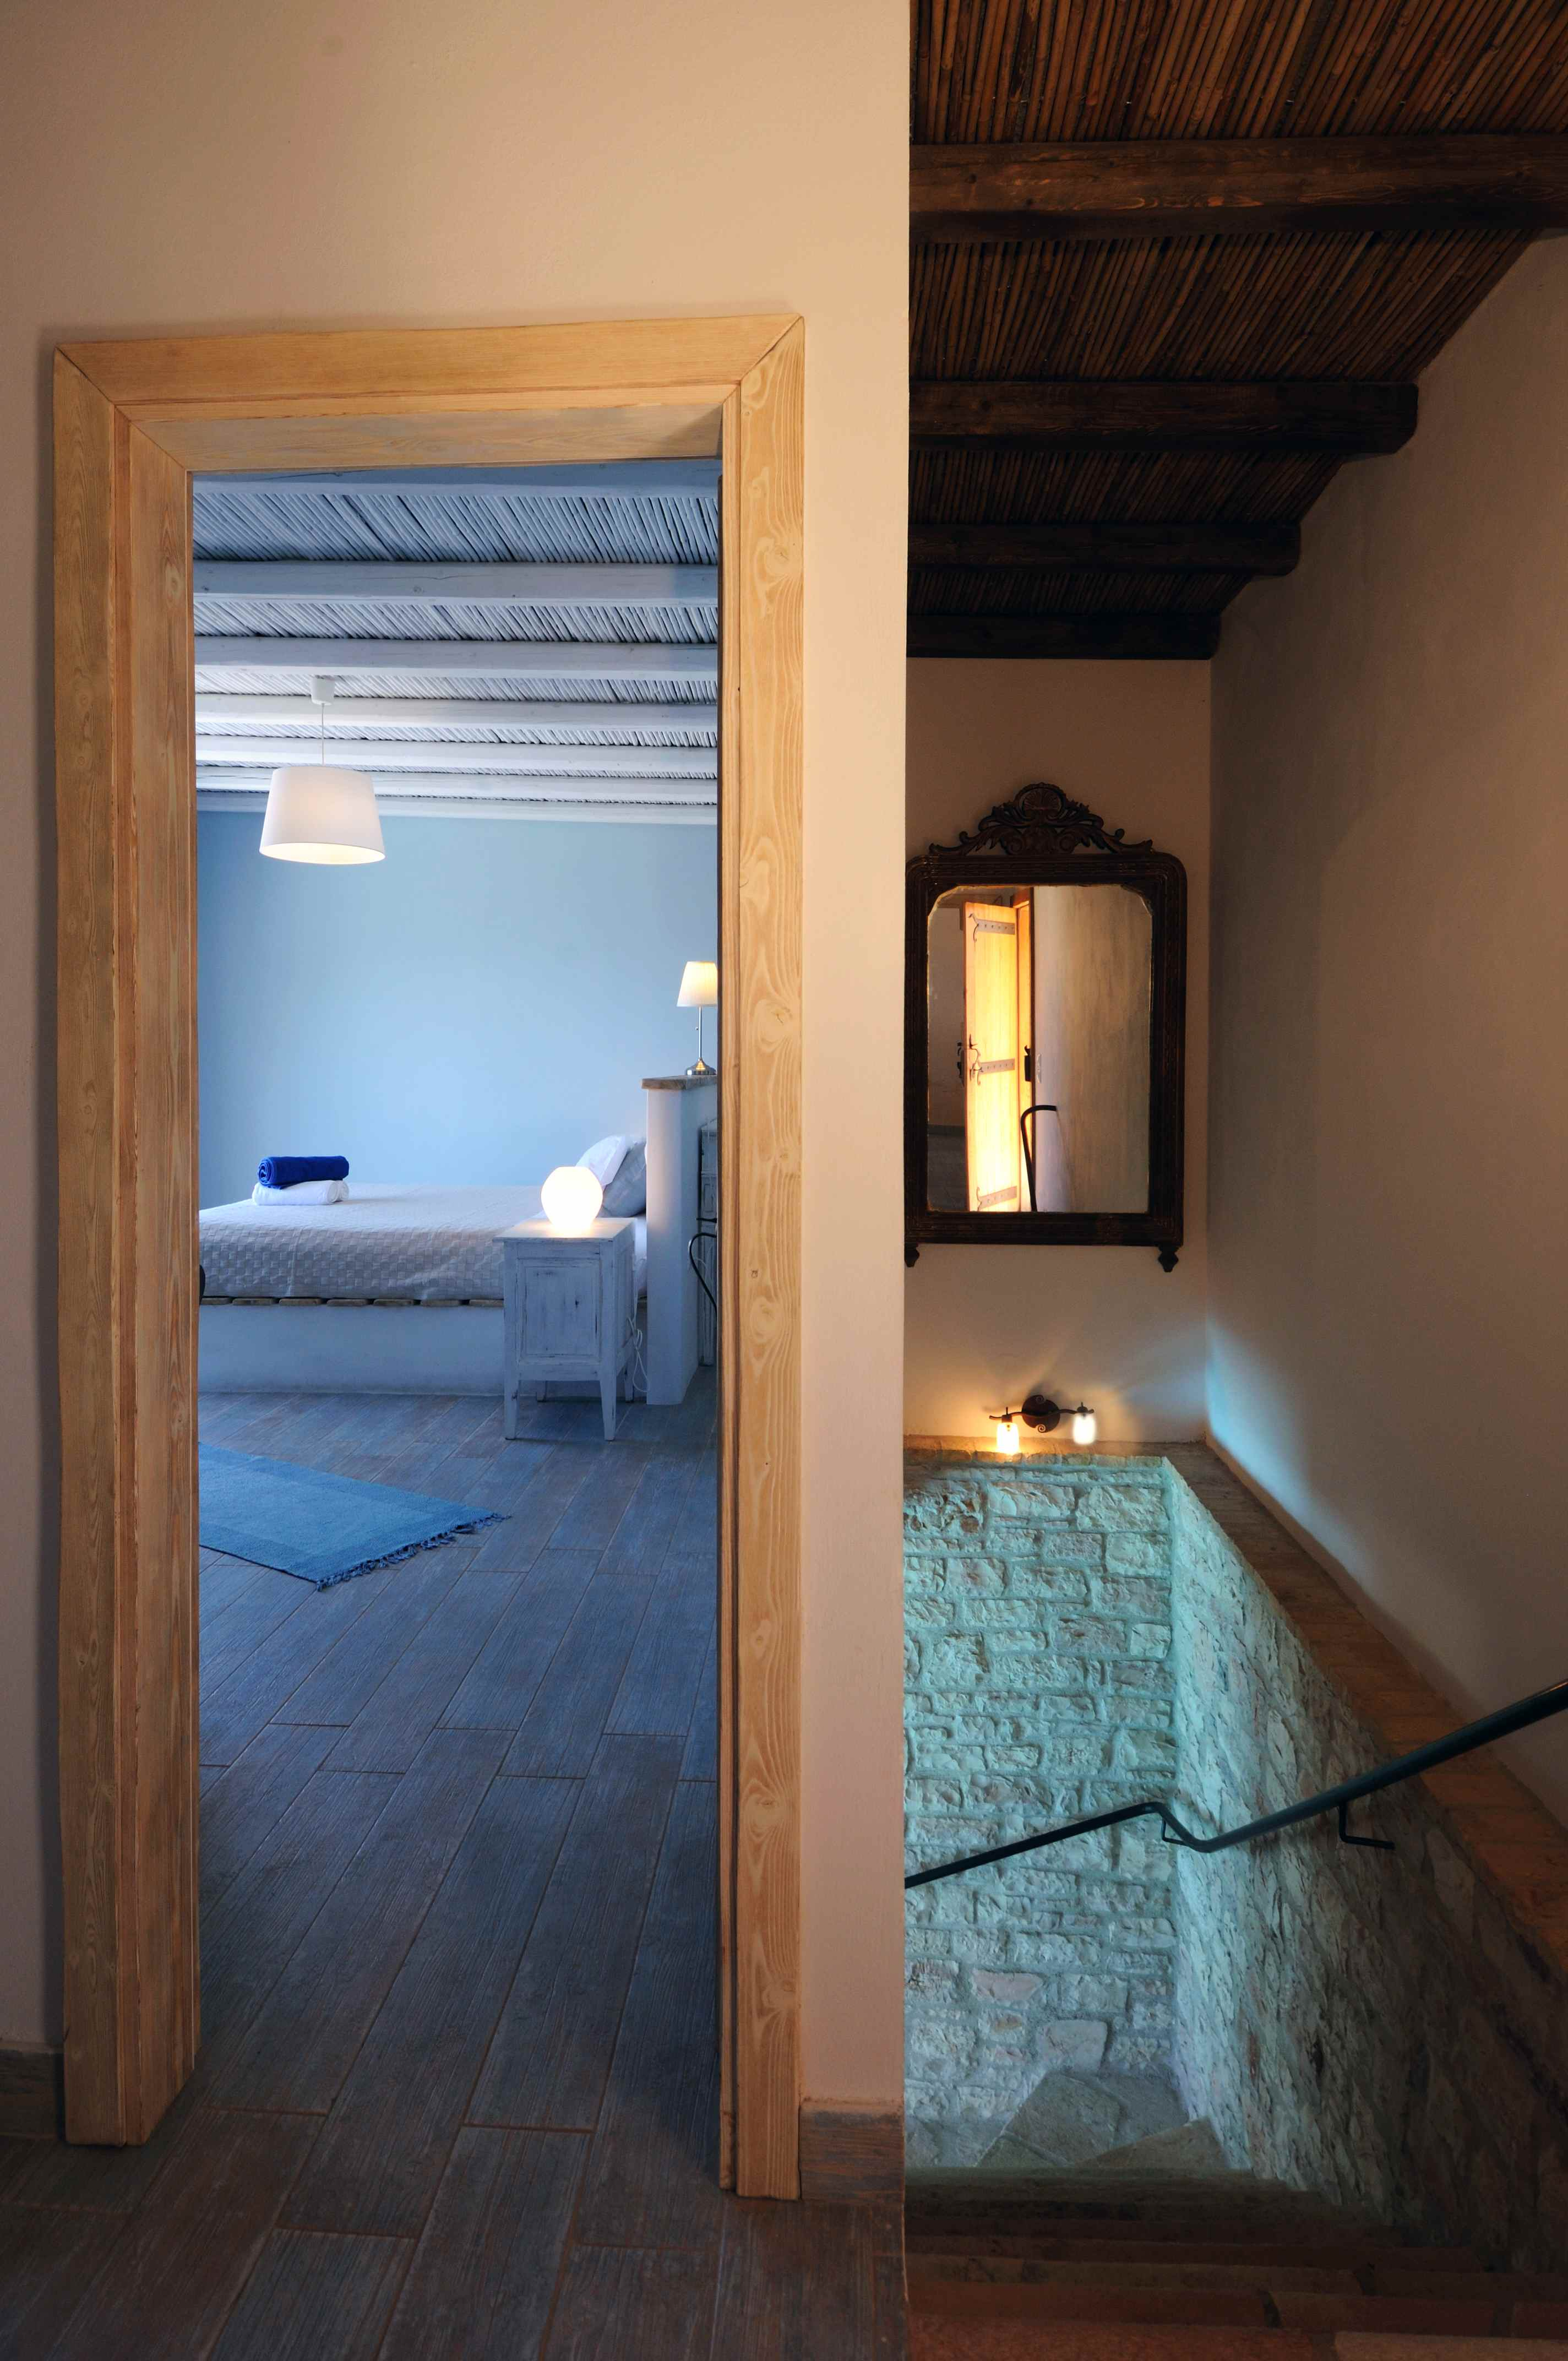 Obergeschoss - Korfu Villa Steilküste, Agios Spiridon, Korfu, Griechenland